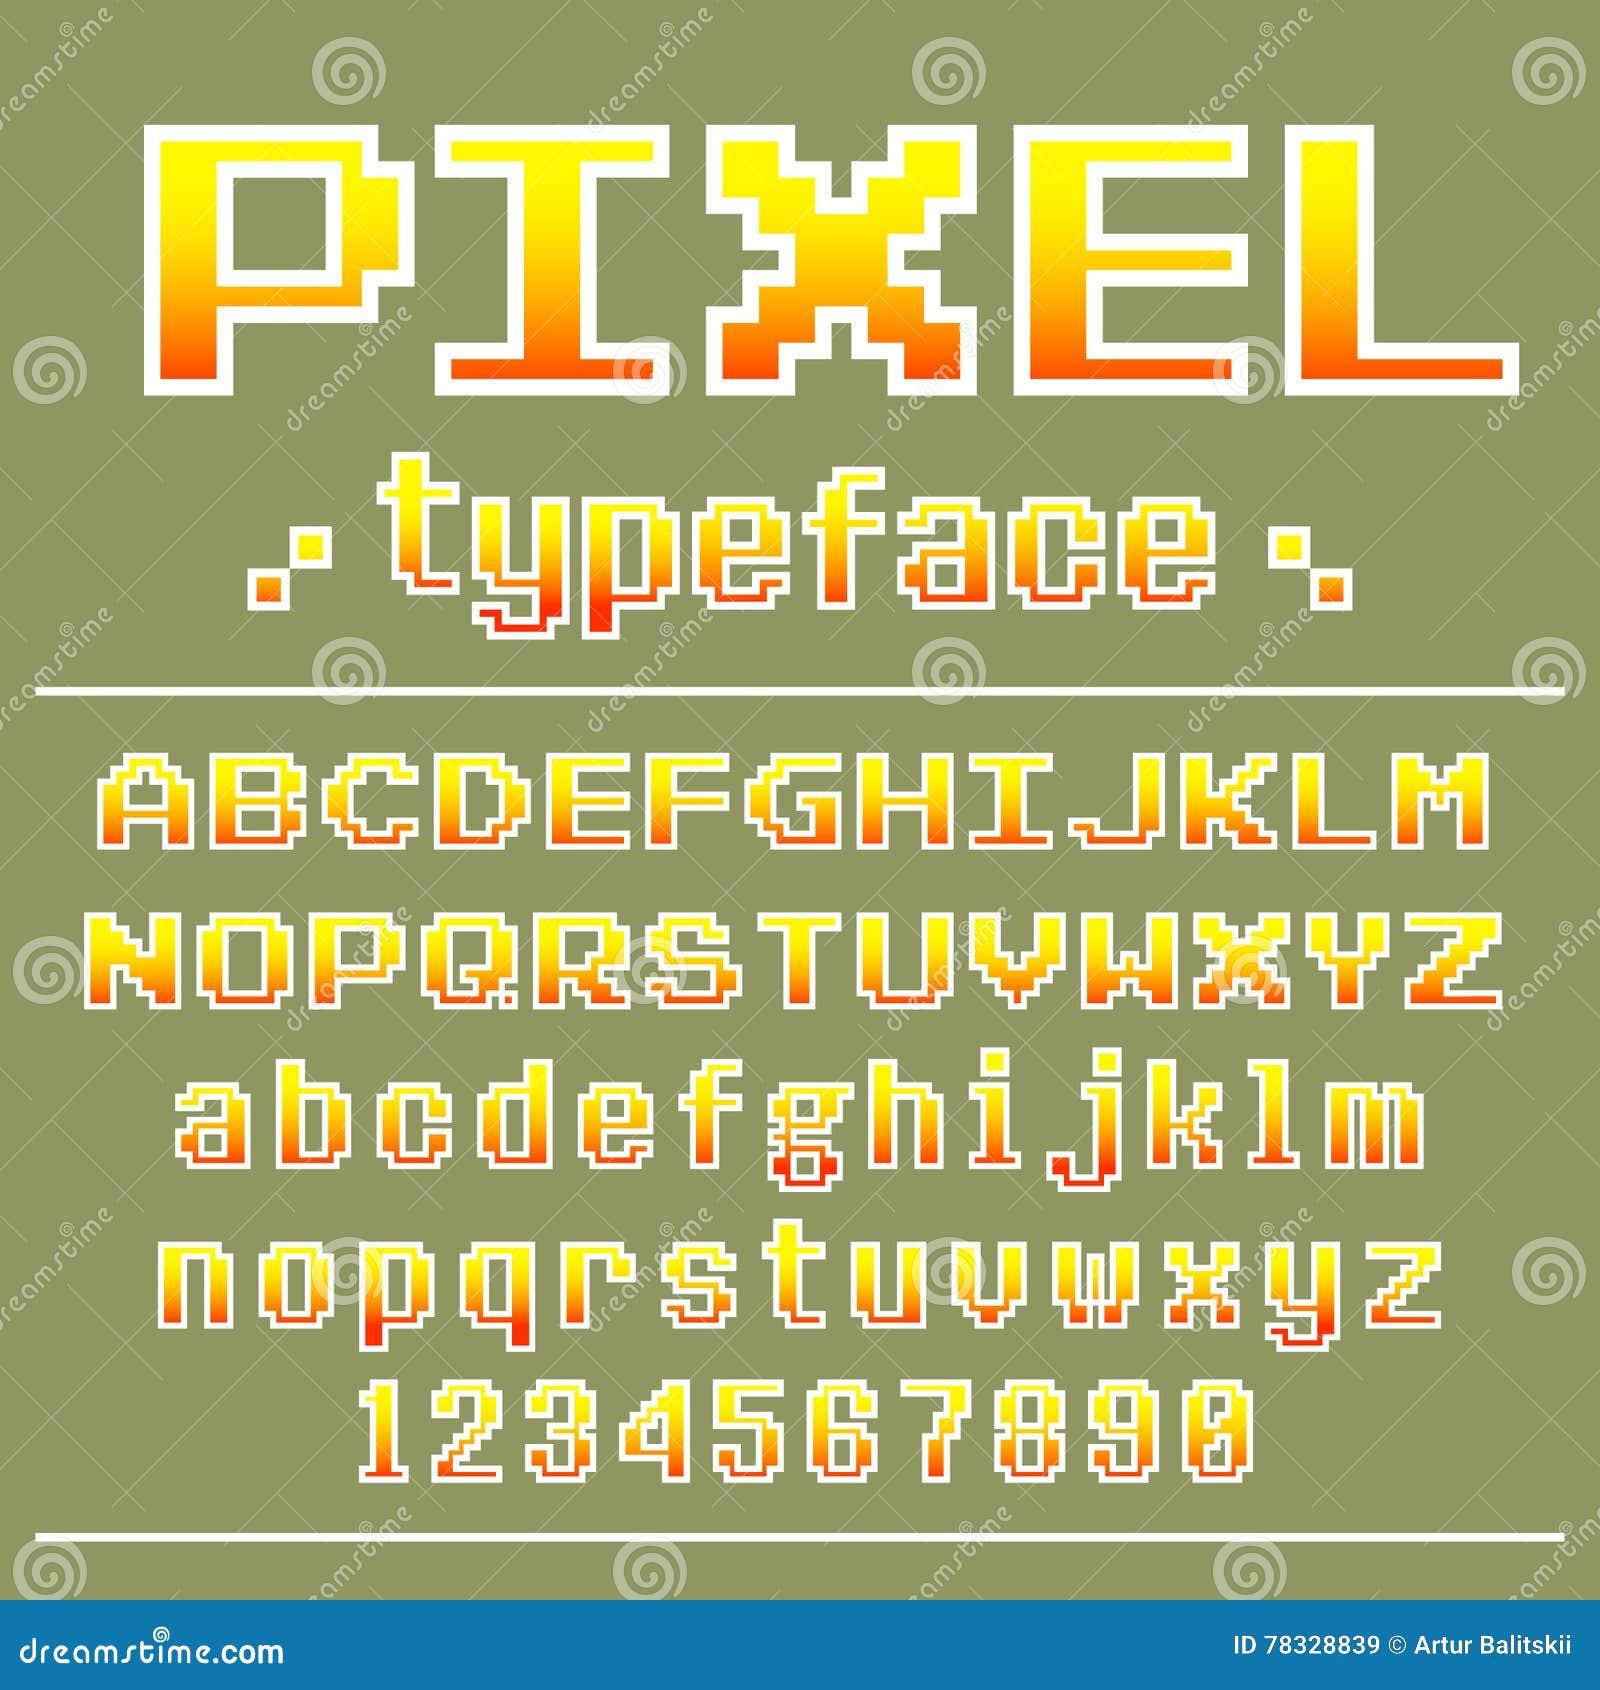 Pixel Font, 8 Bit Typeface For Retro Games Design Stock